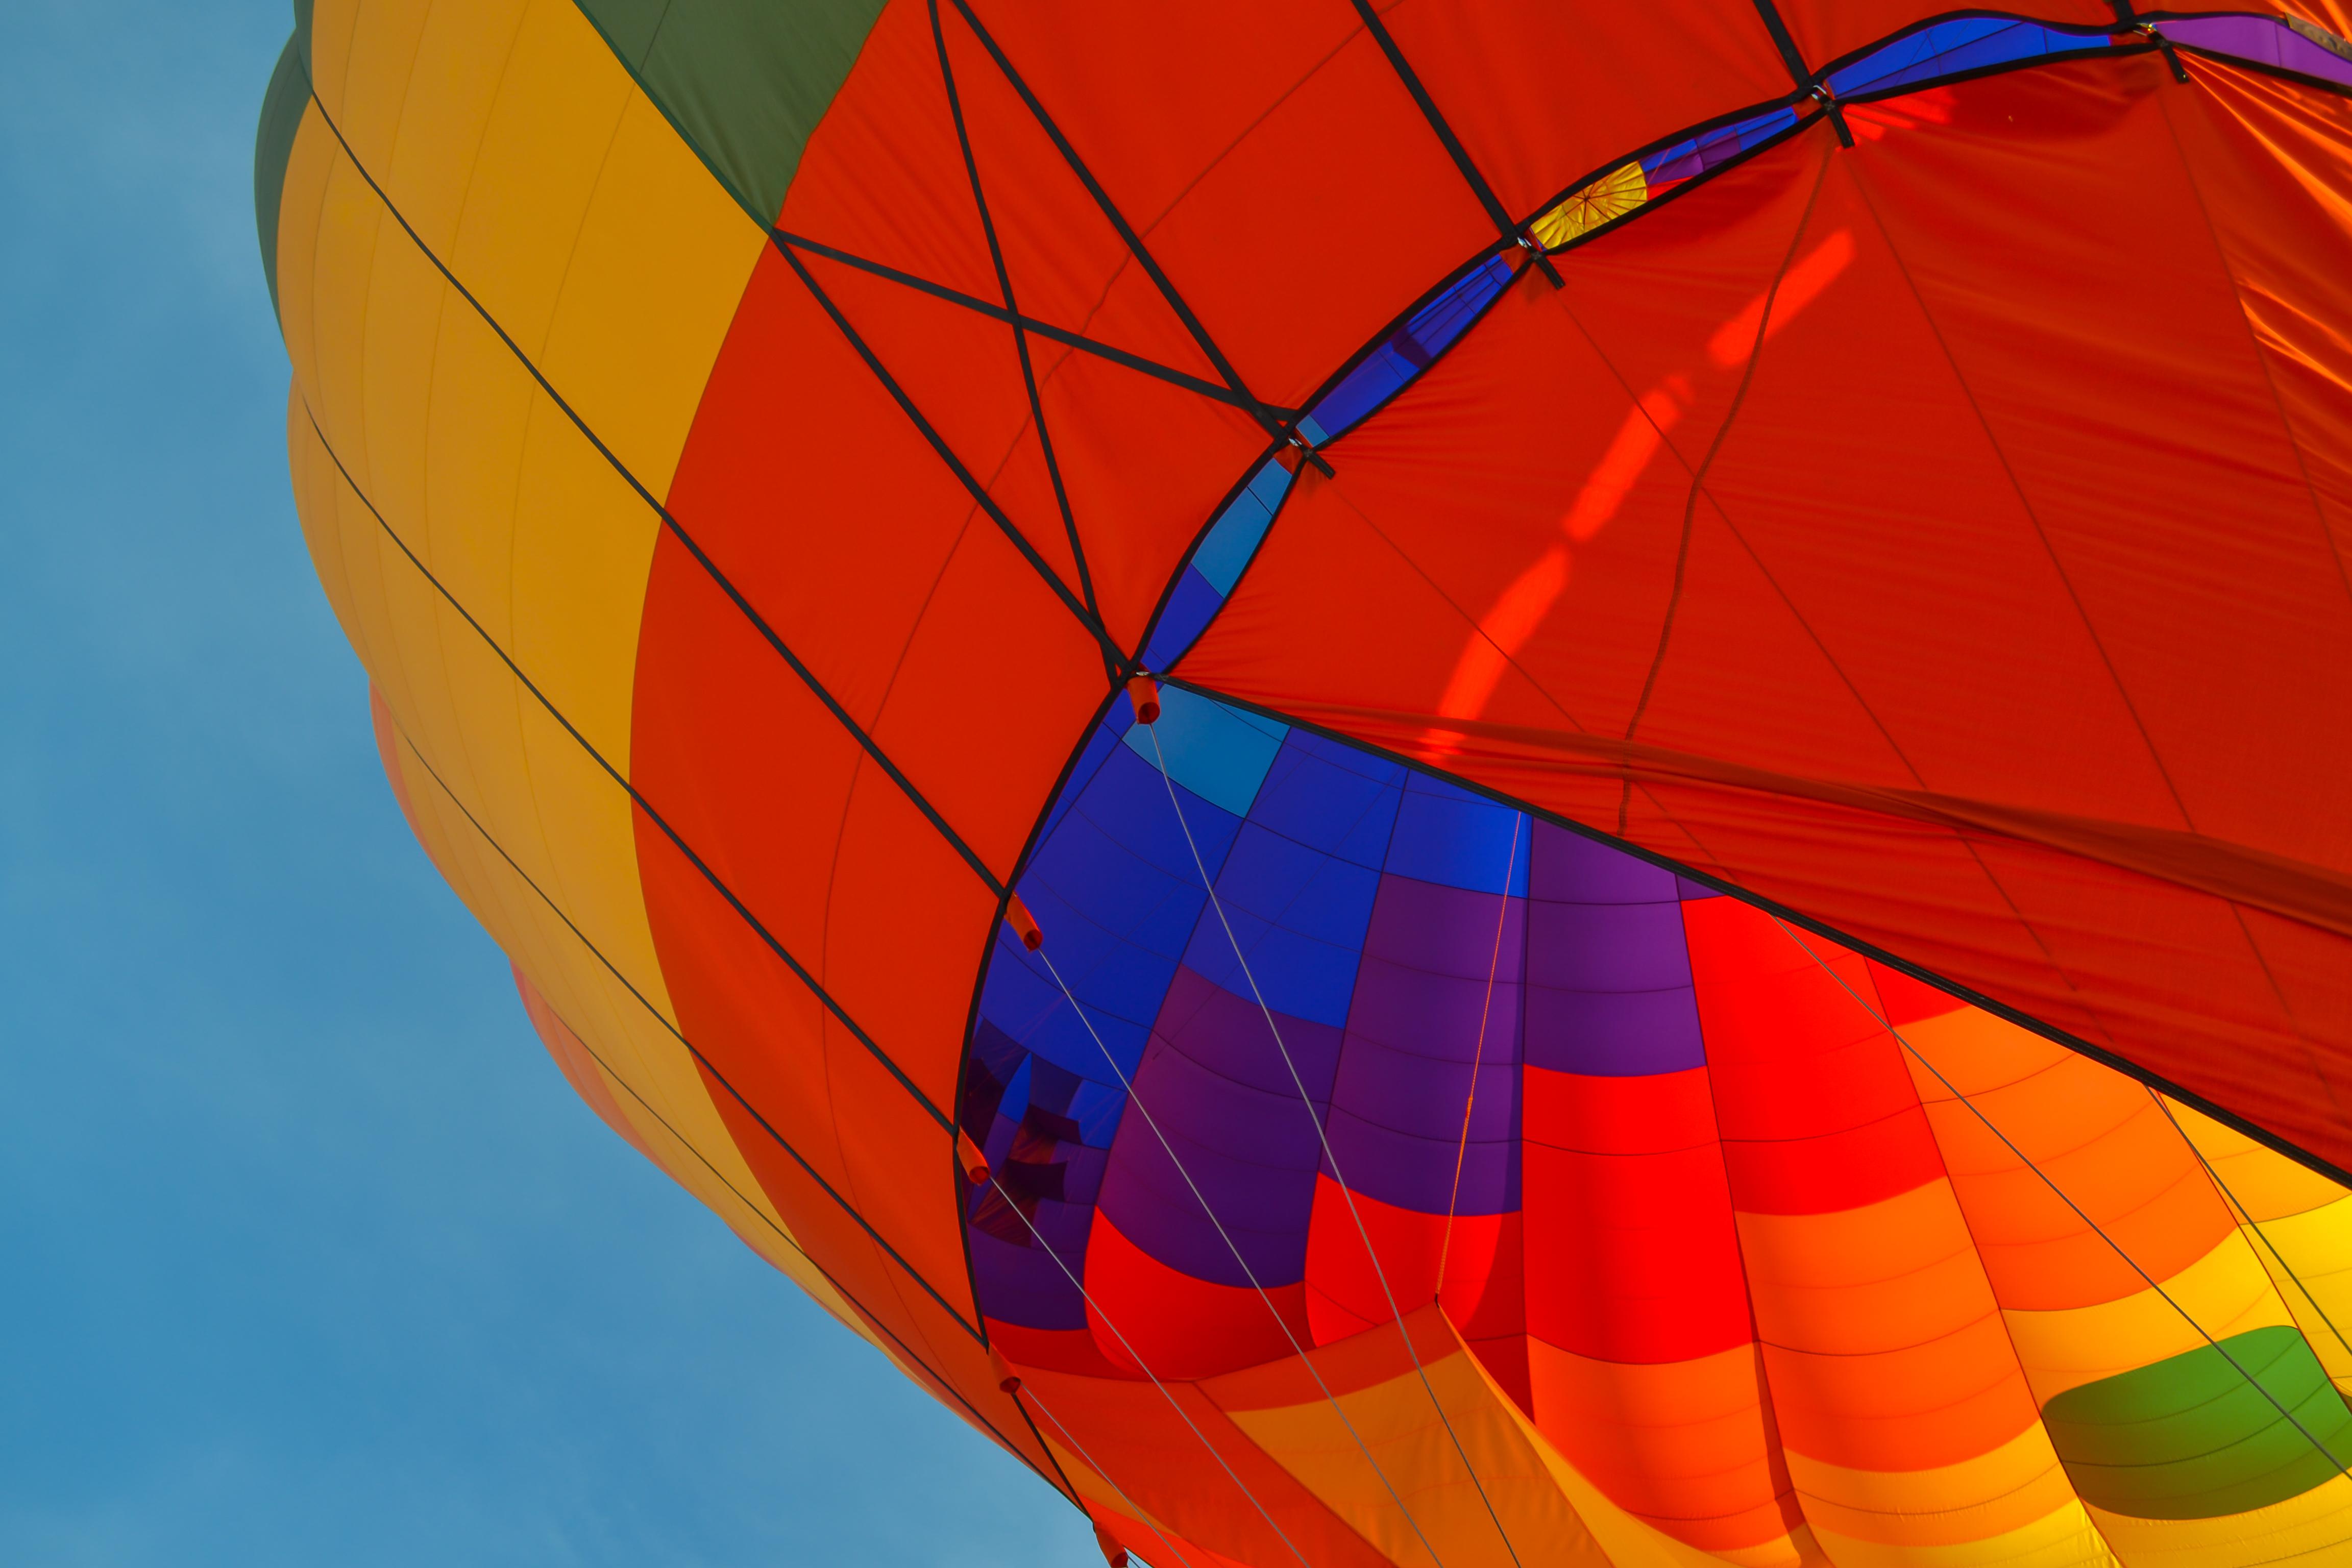 air balloon in scottsdale soaring high above the desert